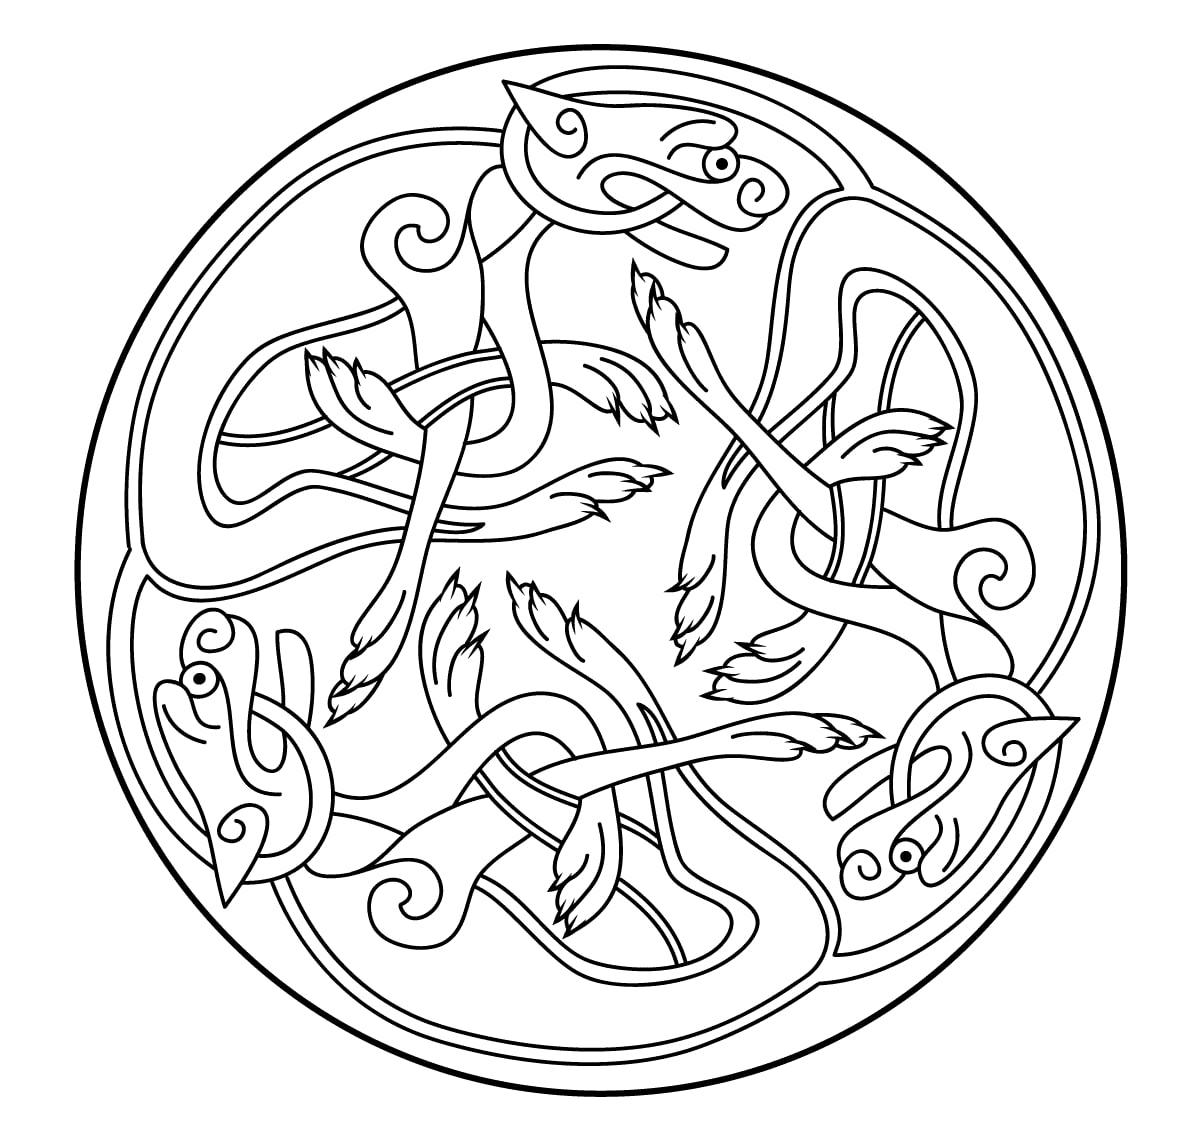 Mandala celtique 25 mandalas de difficult normale 100 - Shamrock foglio da colorare ...